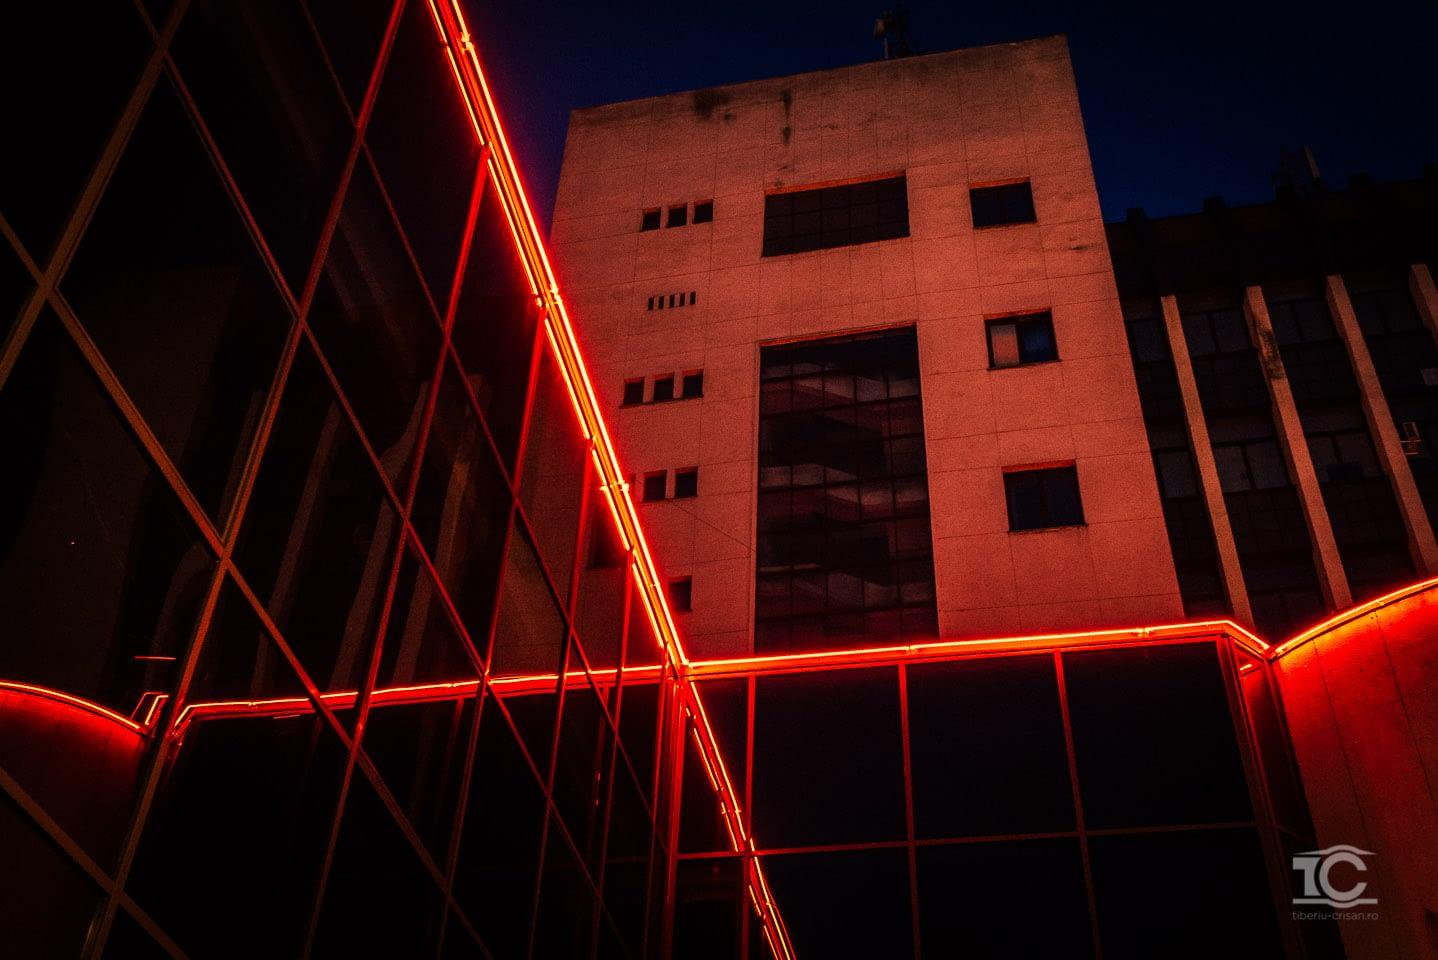 targu-mures-2015-05-noaptea-010